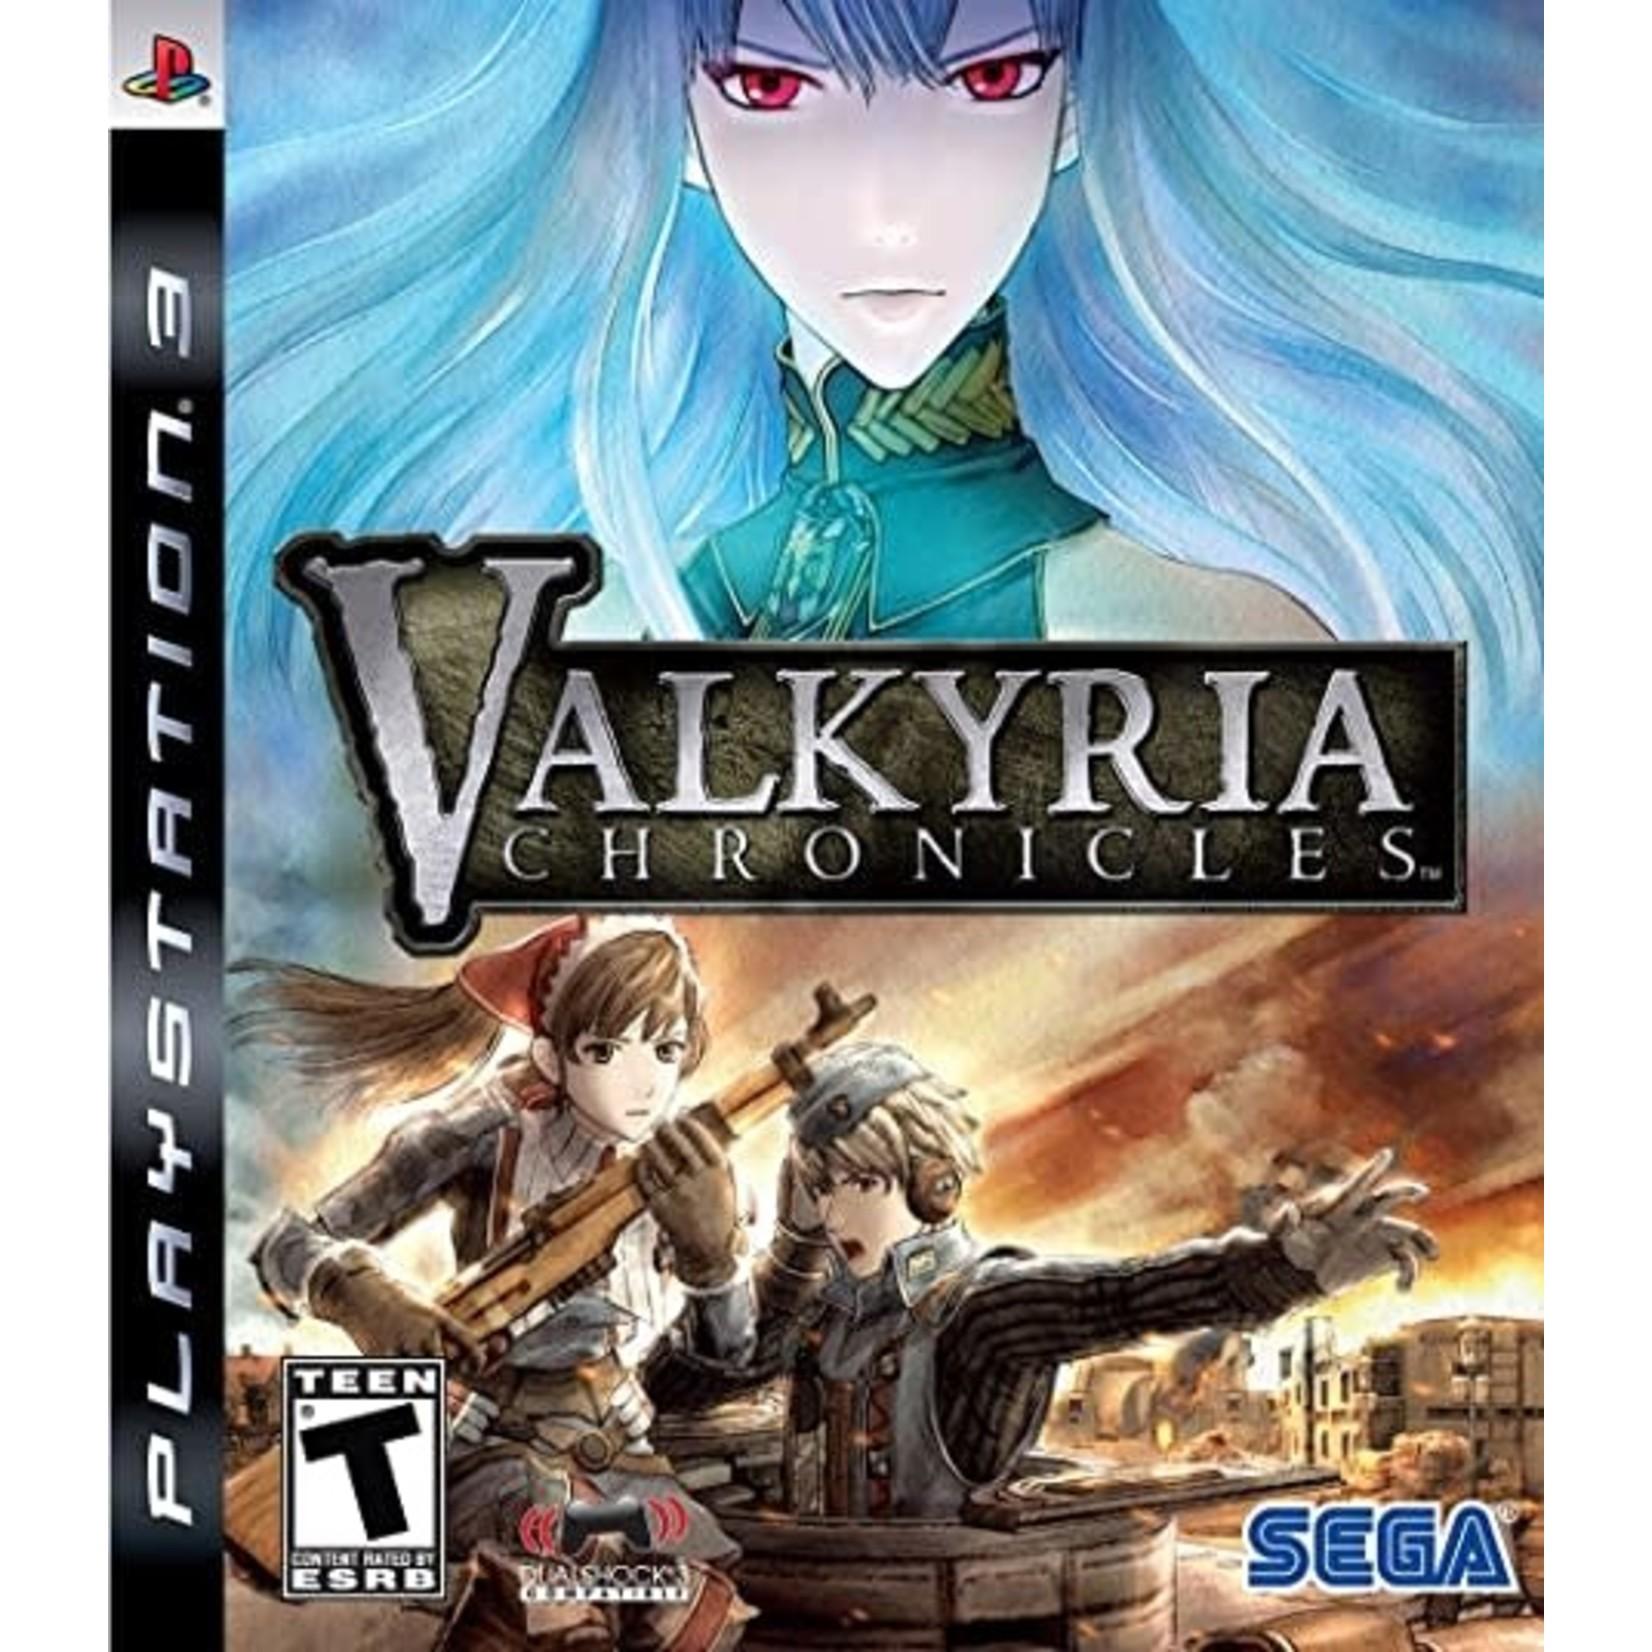 PS3U-Valkyria Chronicles